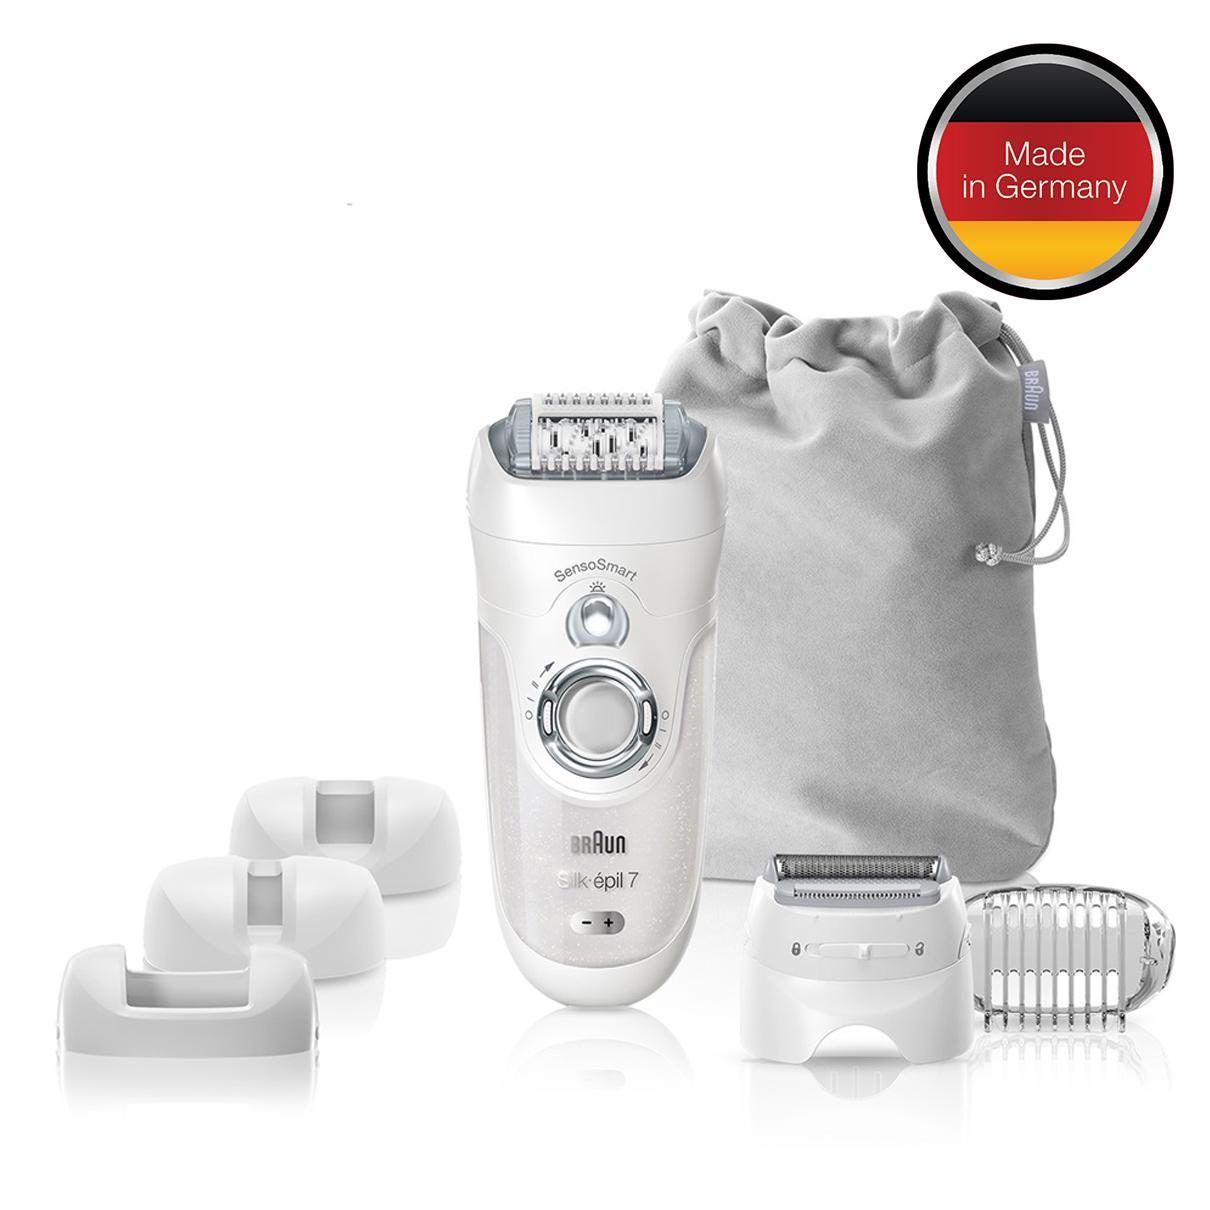 Get Cheap Braun Silk Epil 7 7880 Sensosmart™ Epilator Silver Cordless Wet Dry Epilator With 7 Extras